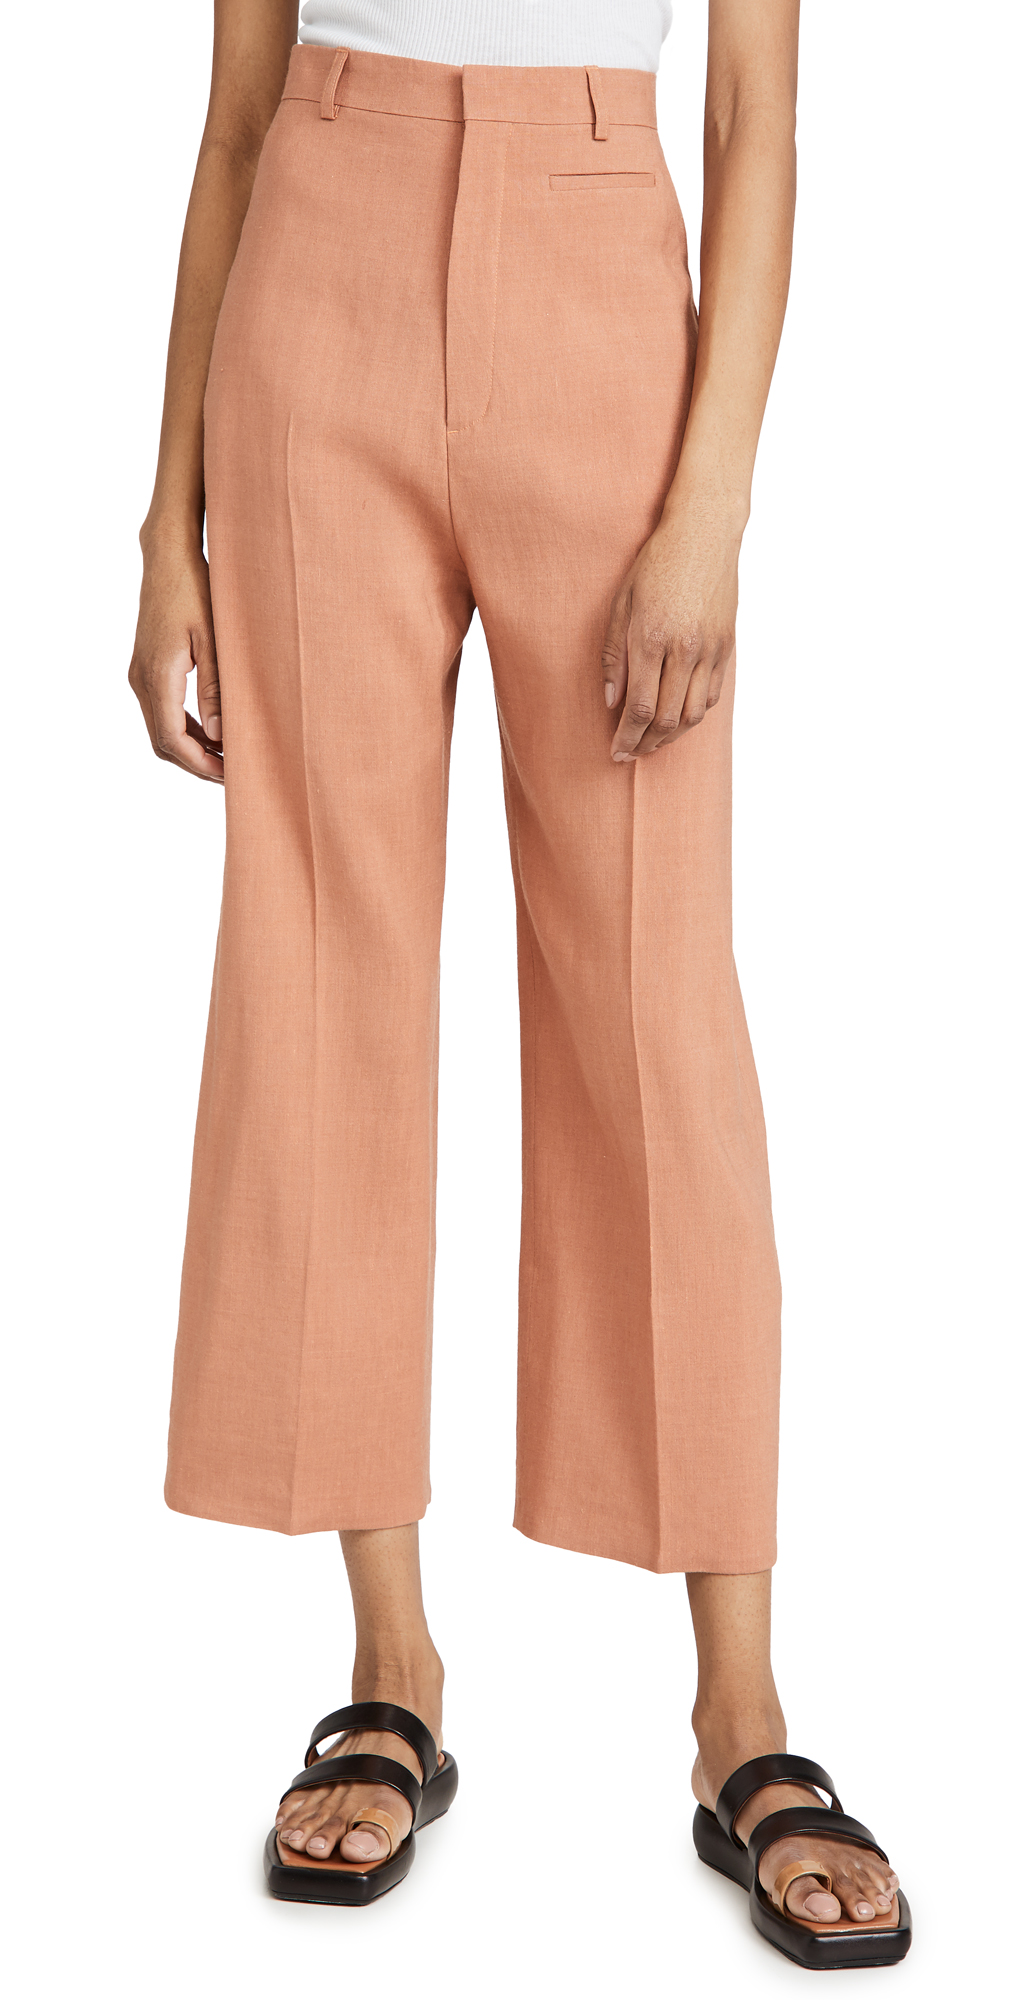 Jacquemus Santon Cropped Pants